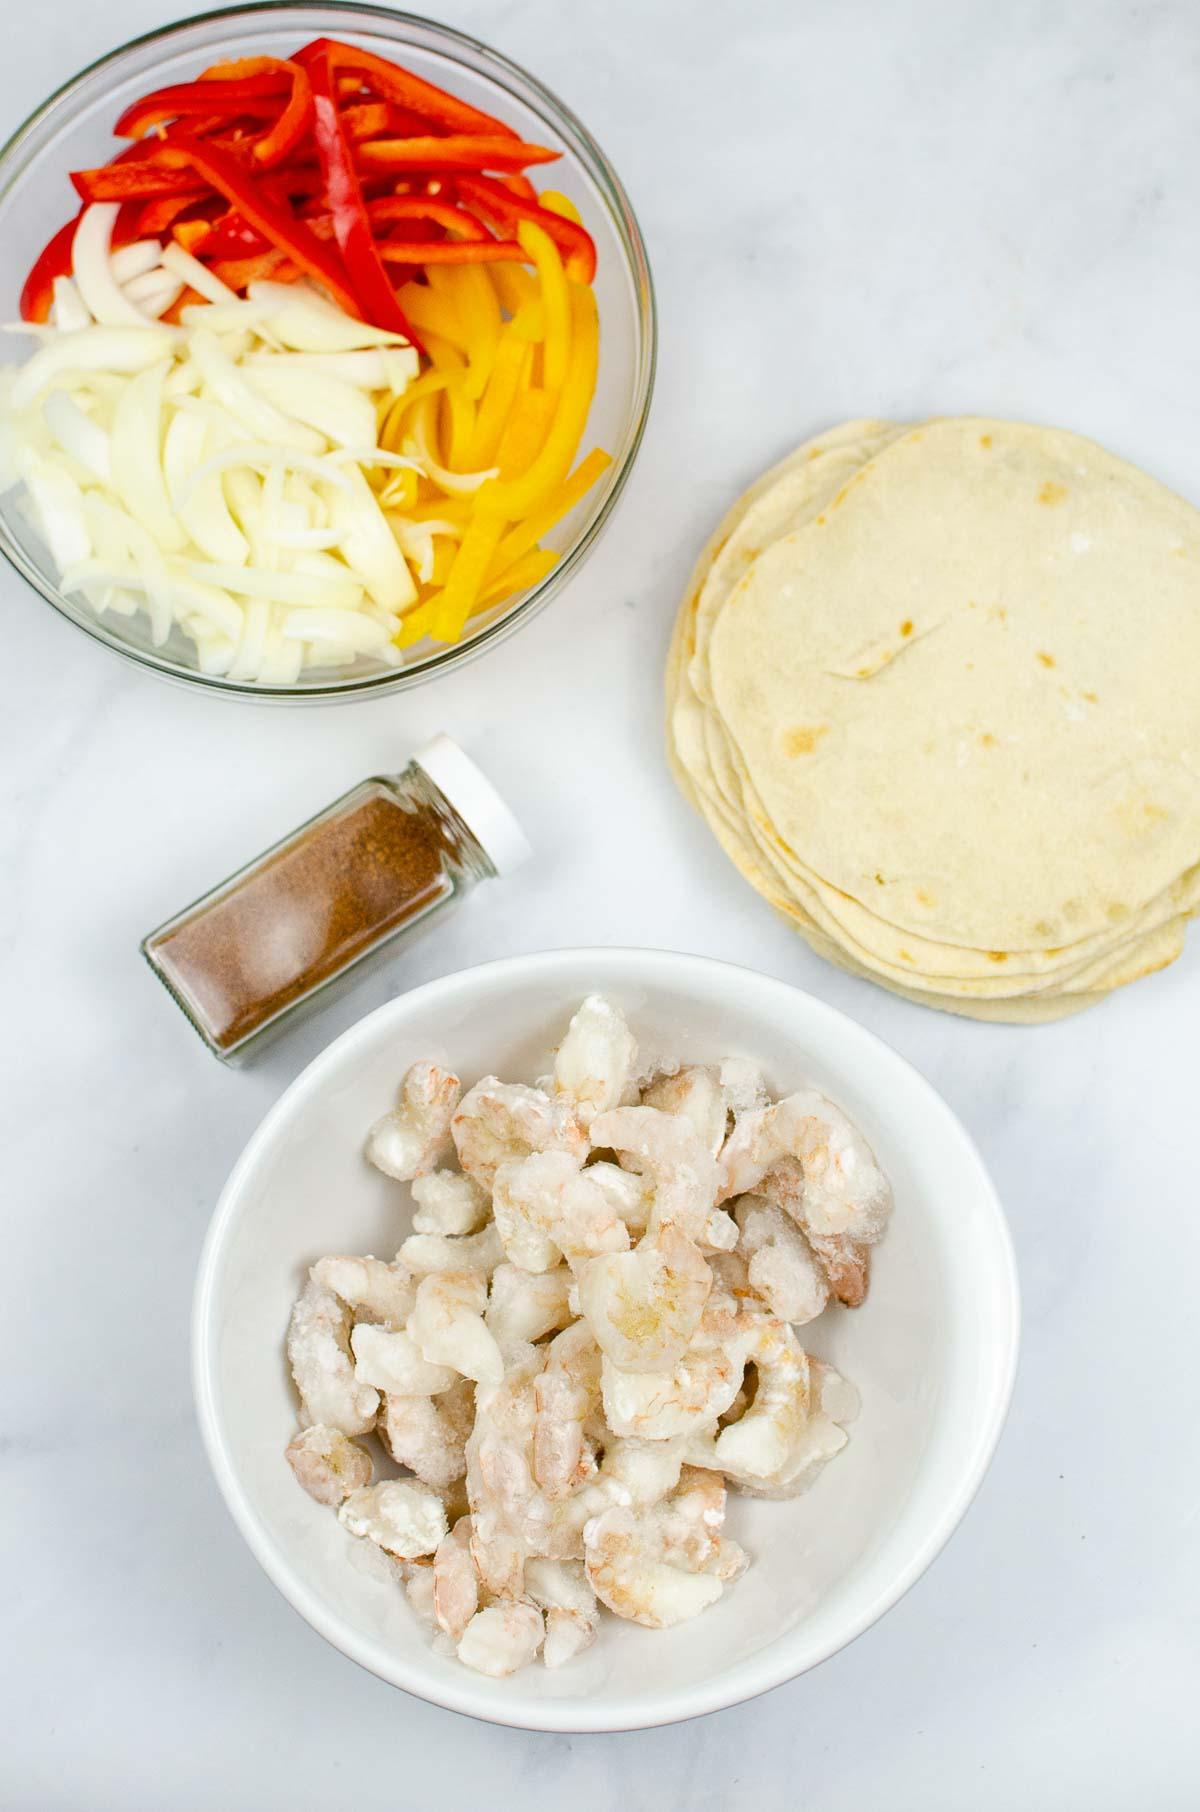 Ingredients for shrimp fajitas: sliced peppers, onions, shrimp, and fajita seasoning.